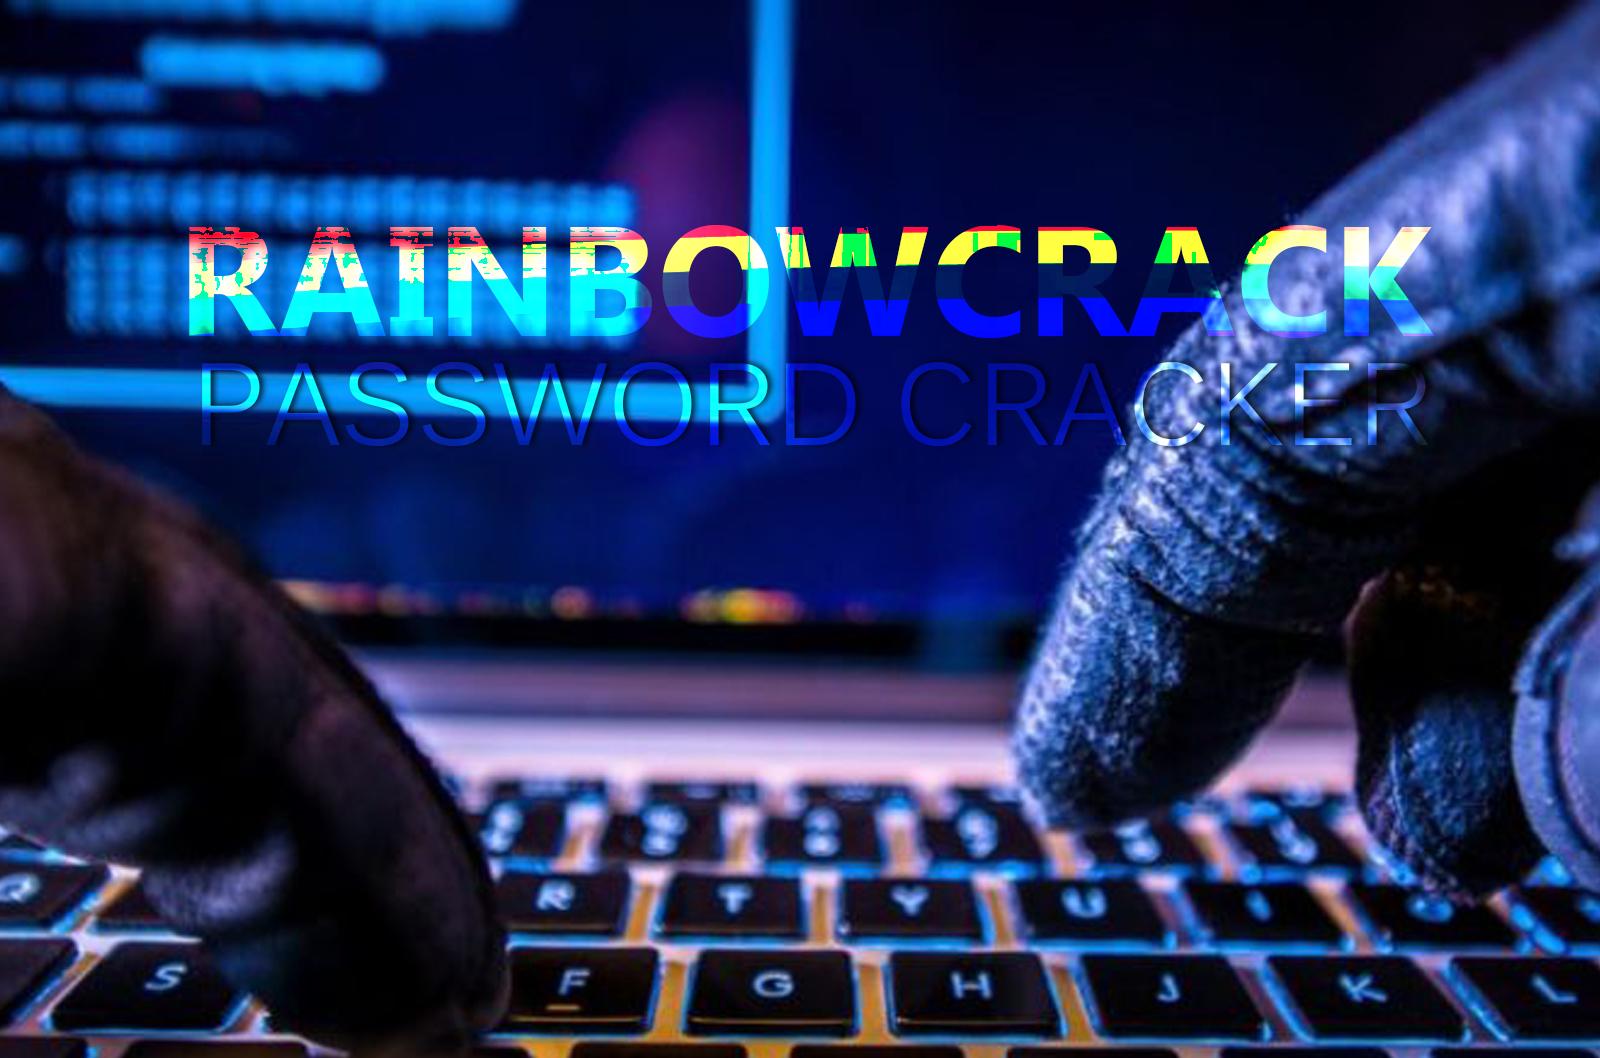 RainbowCrack - Password Cracking Tool - Effect Hacking